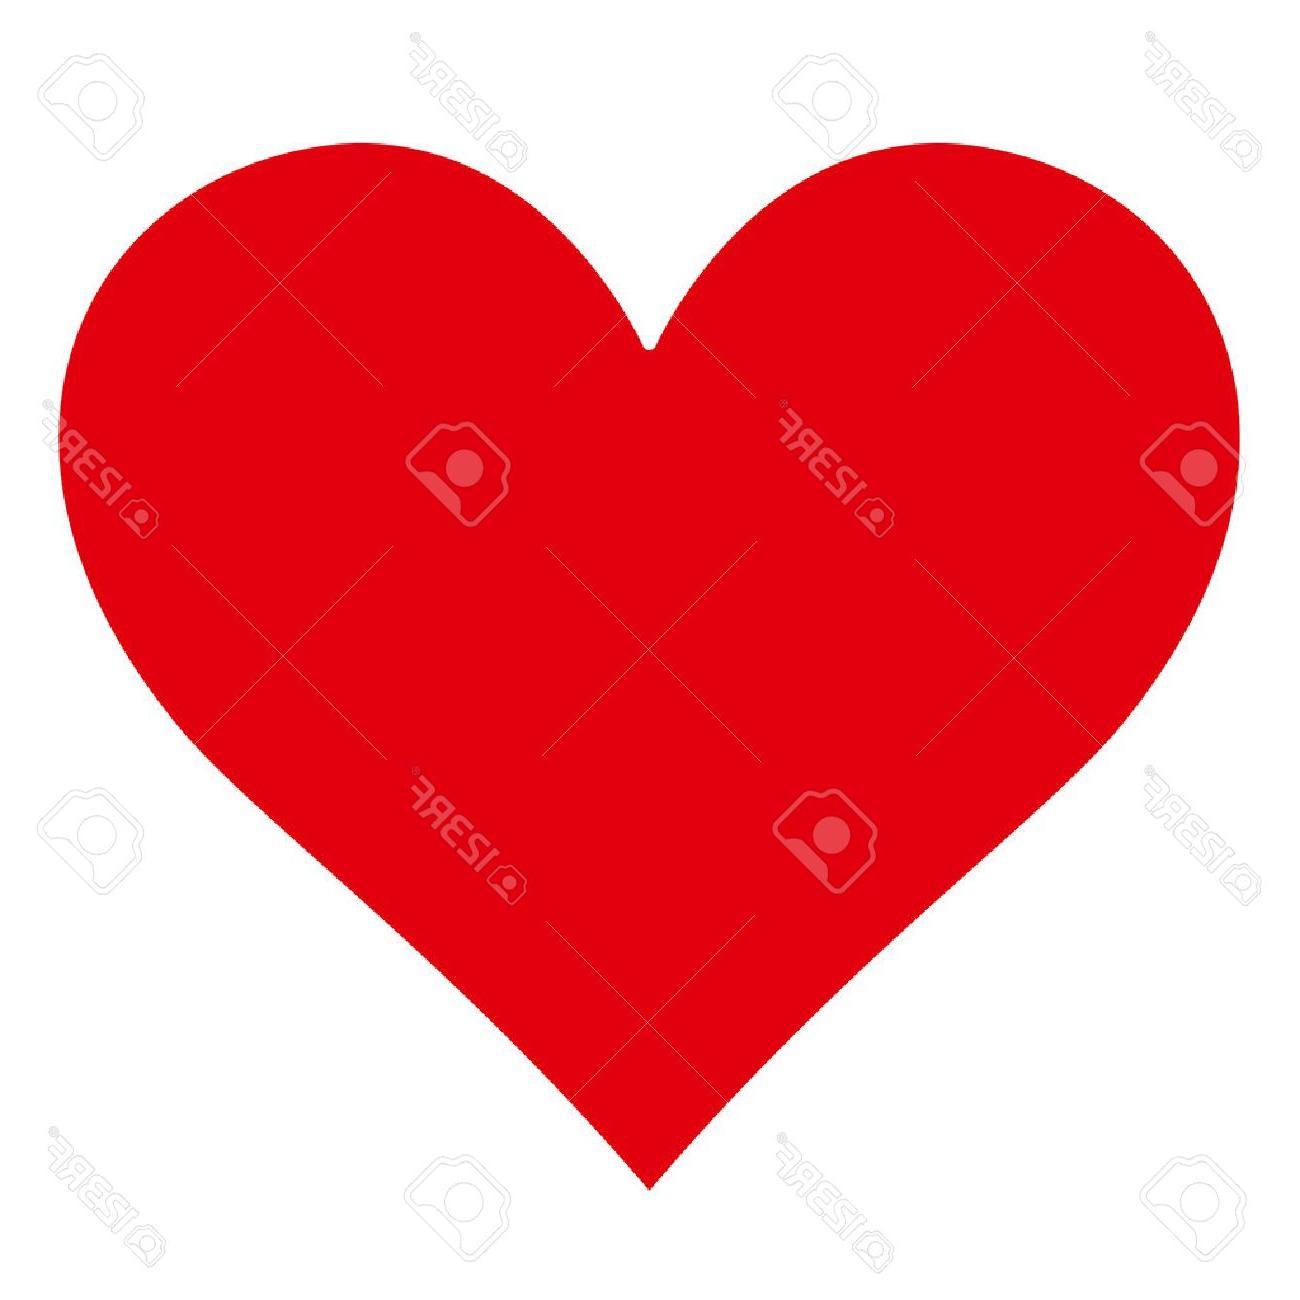 Hearts clipart simple. Best heart clip art